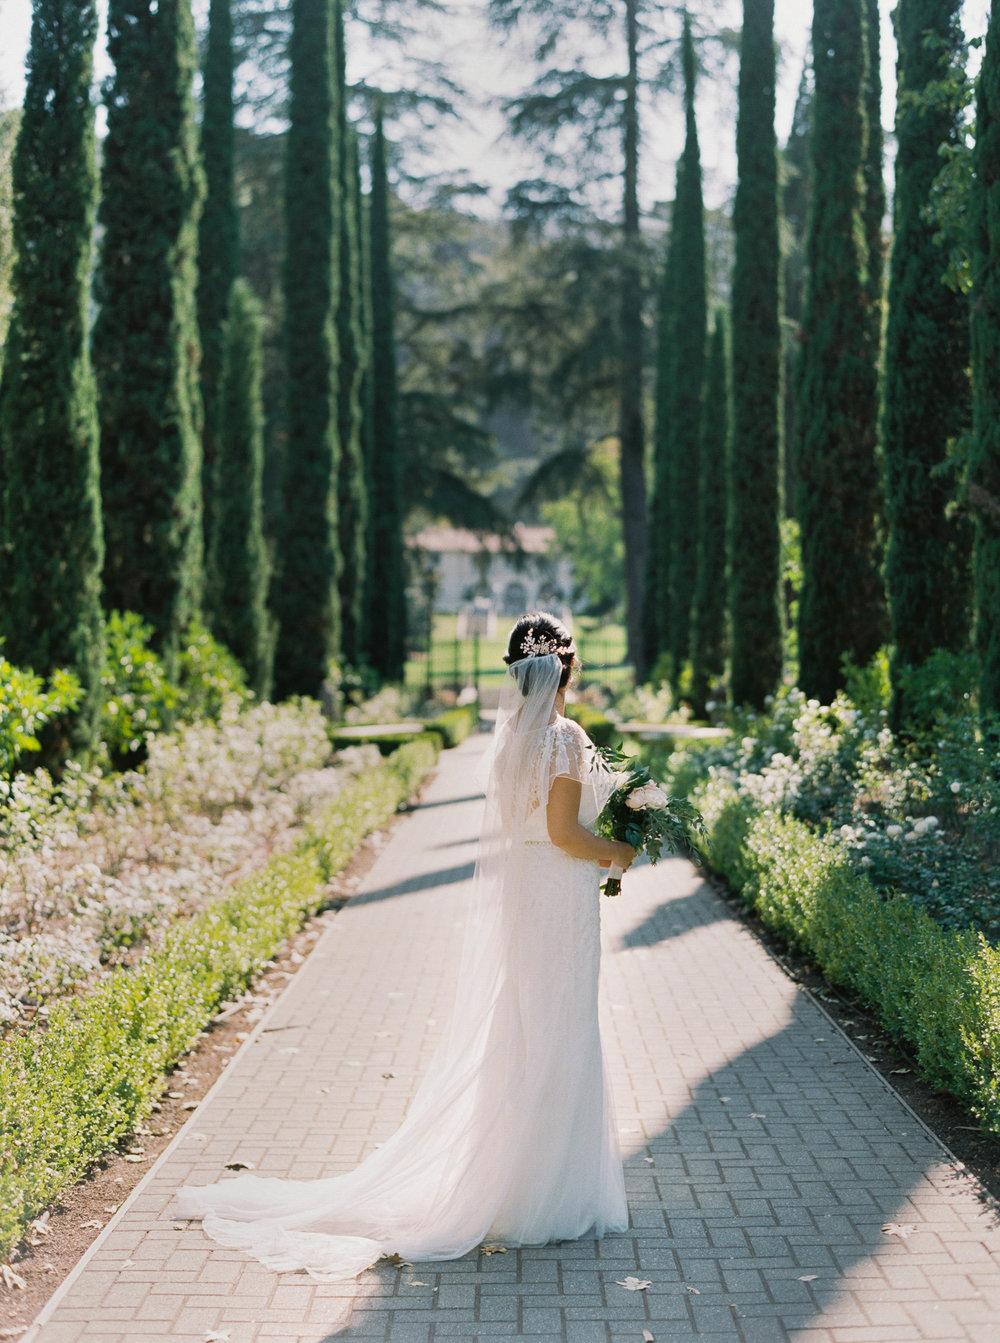 Villa_Montalvo_Wedding_Photographer_Videographer_San_Francisco080.jpg